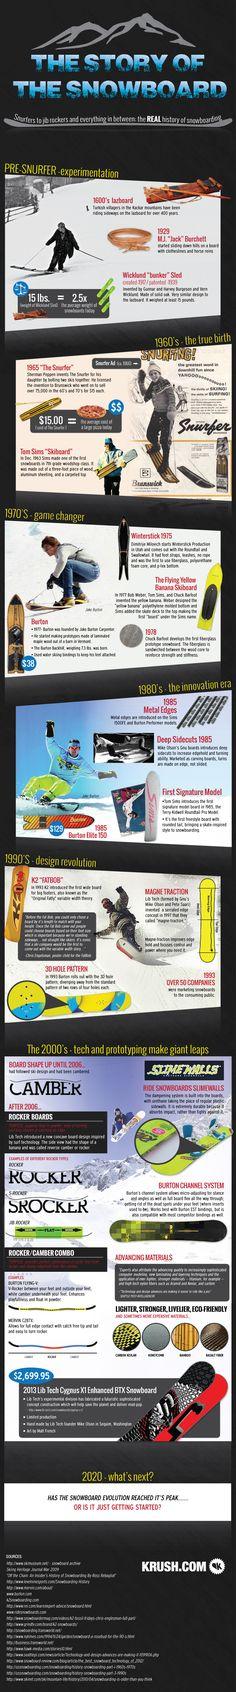 History of Snowboarding